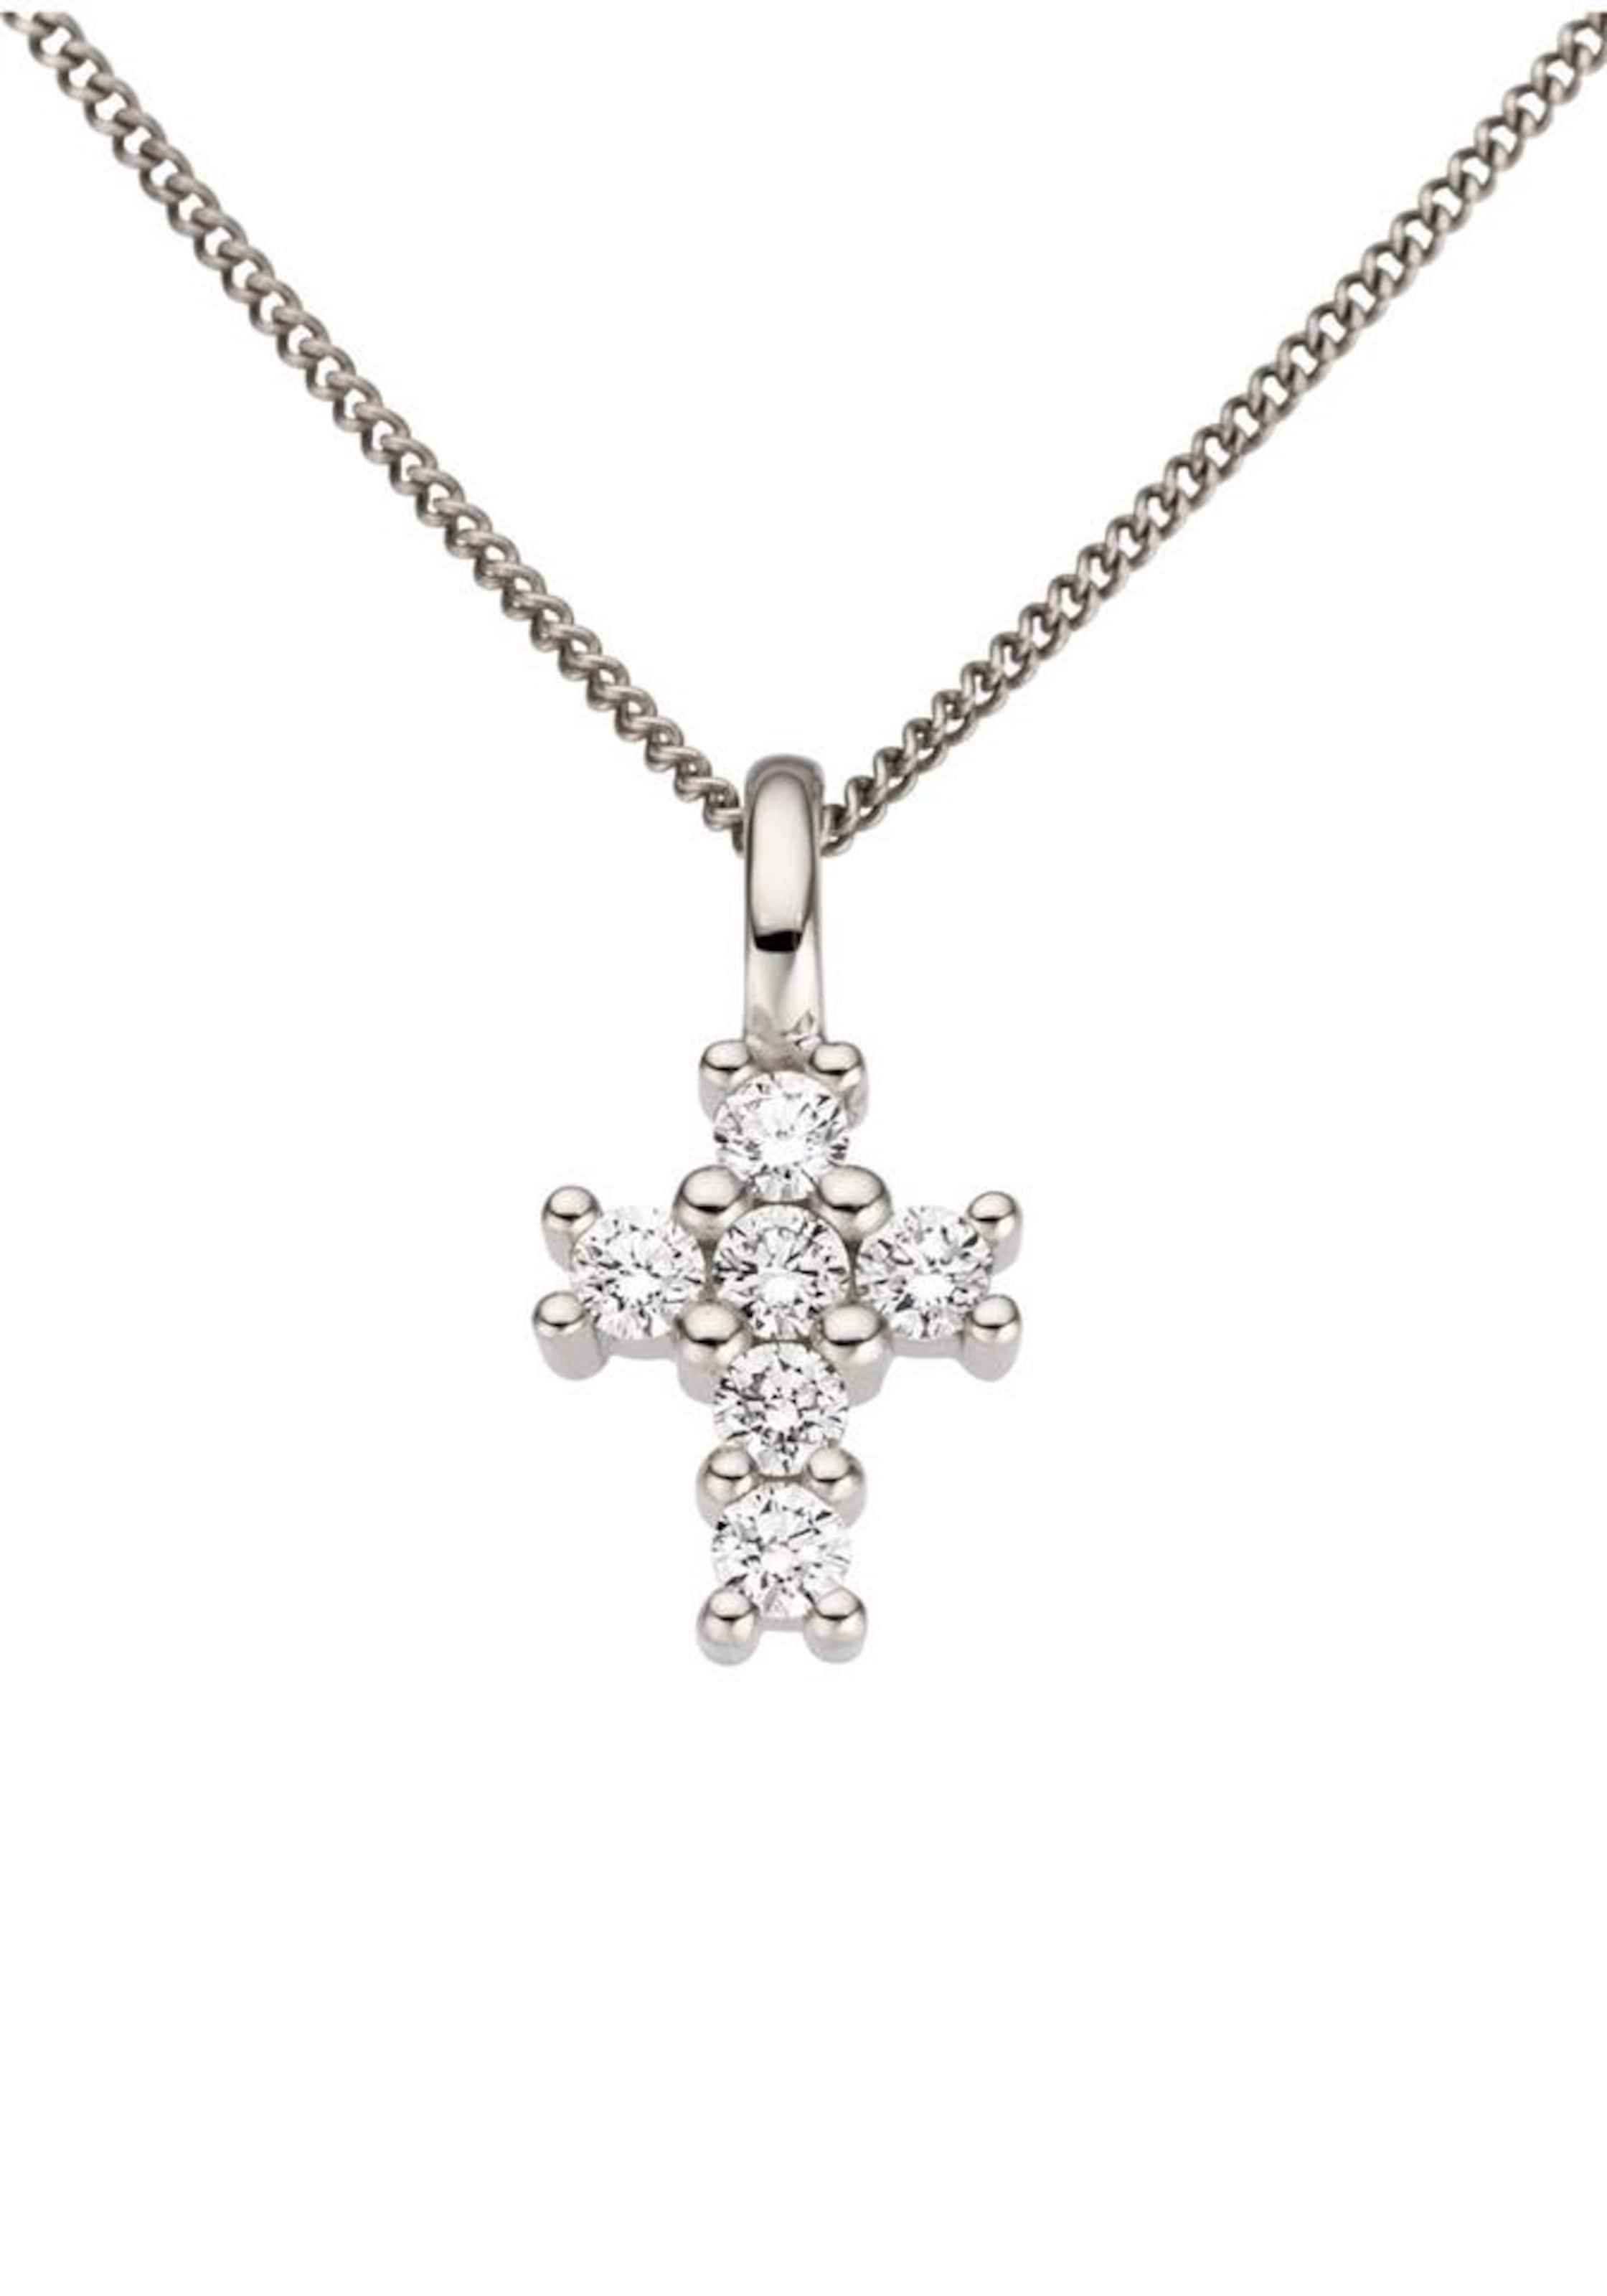 Offizieller Online-Verkauf Extrem Verkauf Online VIVANCE jewels Kreuzanhänger LFnJG